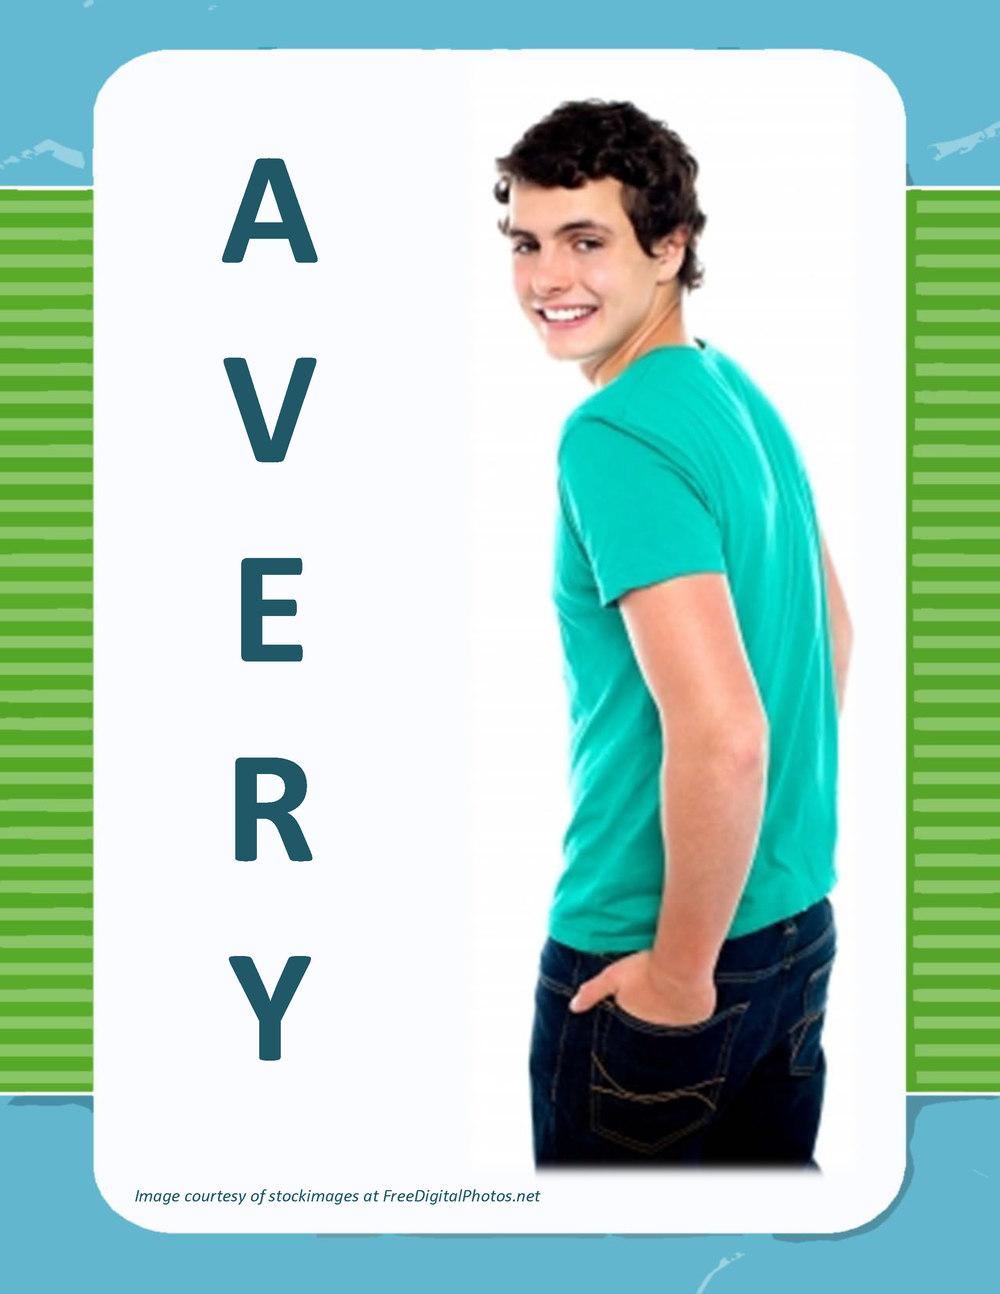 Avery Photo.jpg